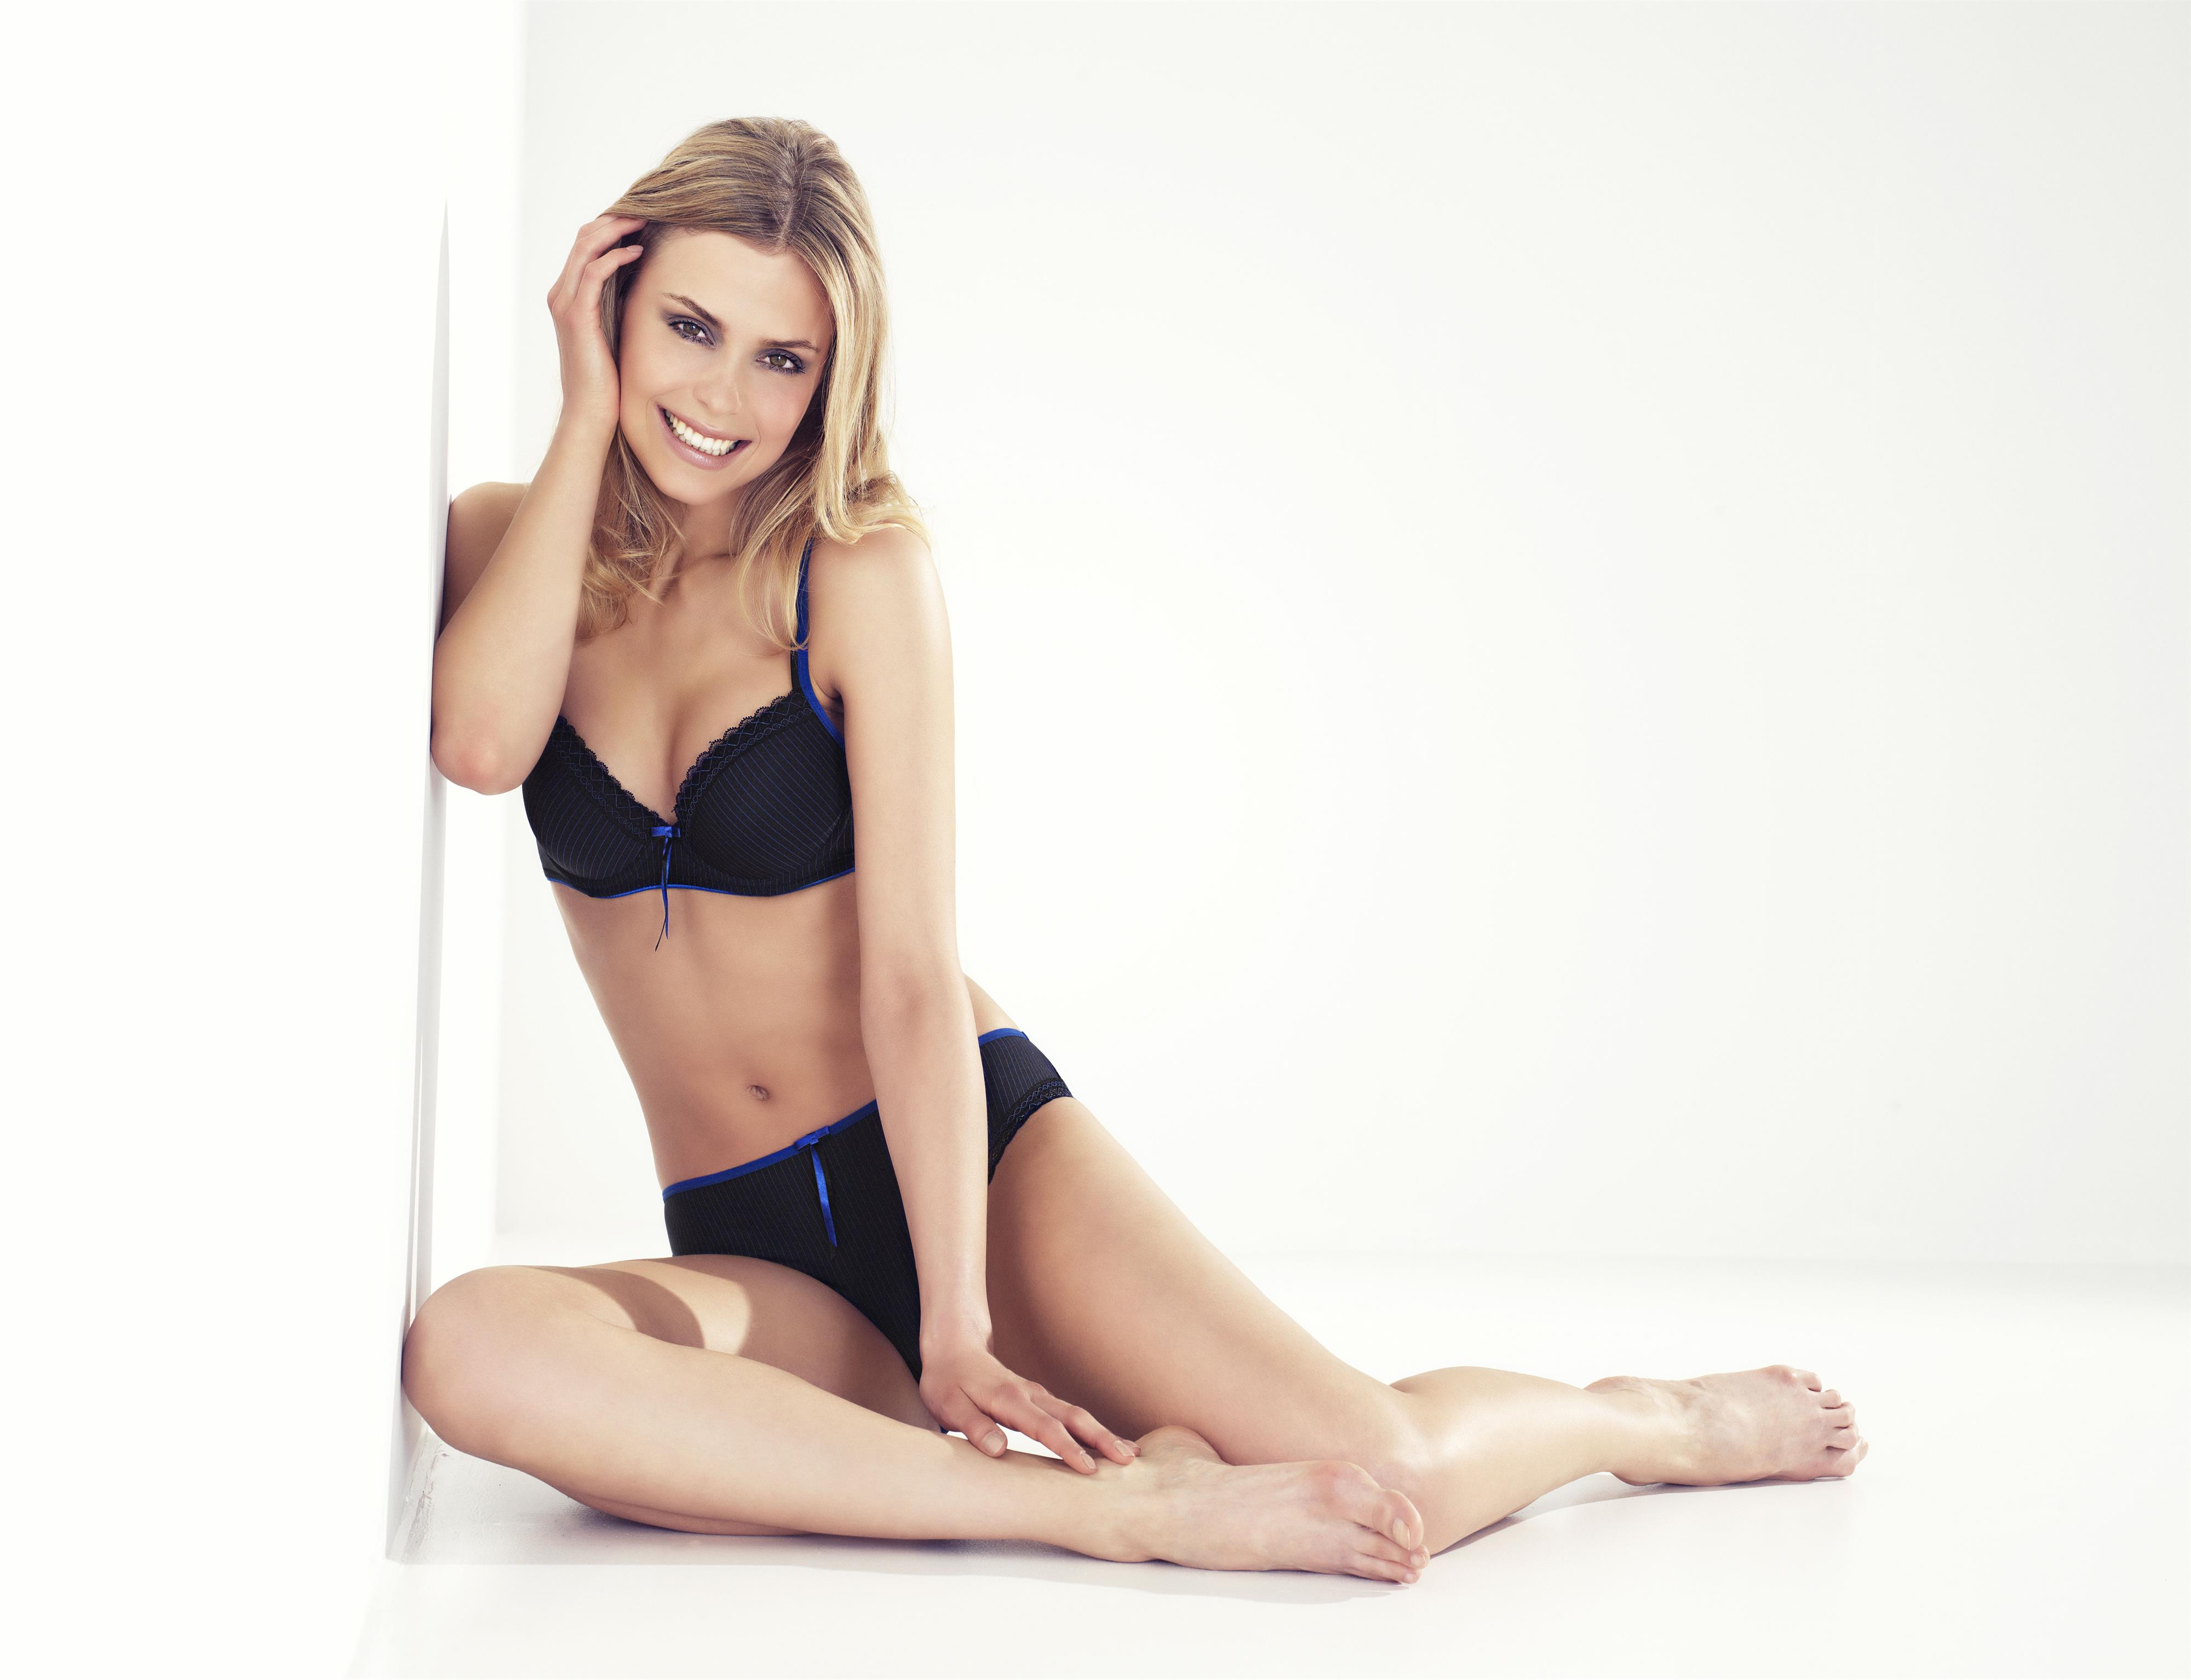 Stine Sowart in lingerie